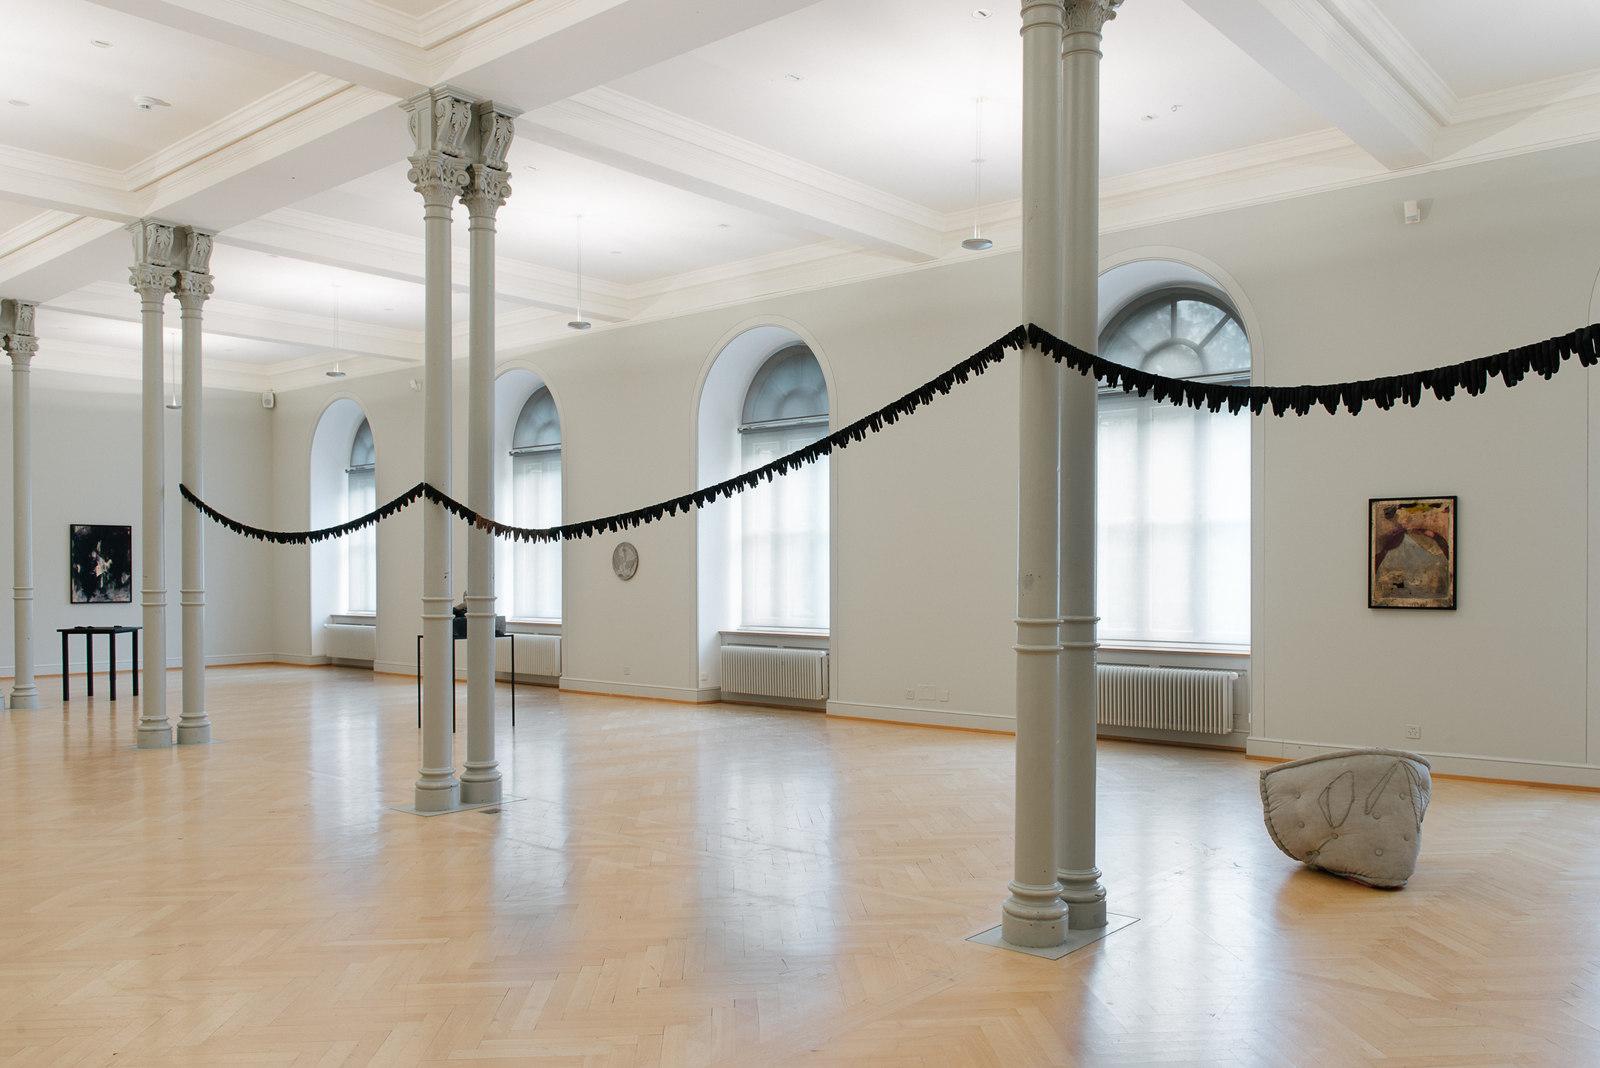 06_Installationsansicht_St.Gallen_Foto_Sebastian_Stadler